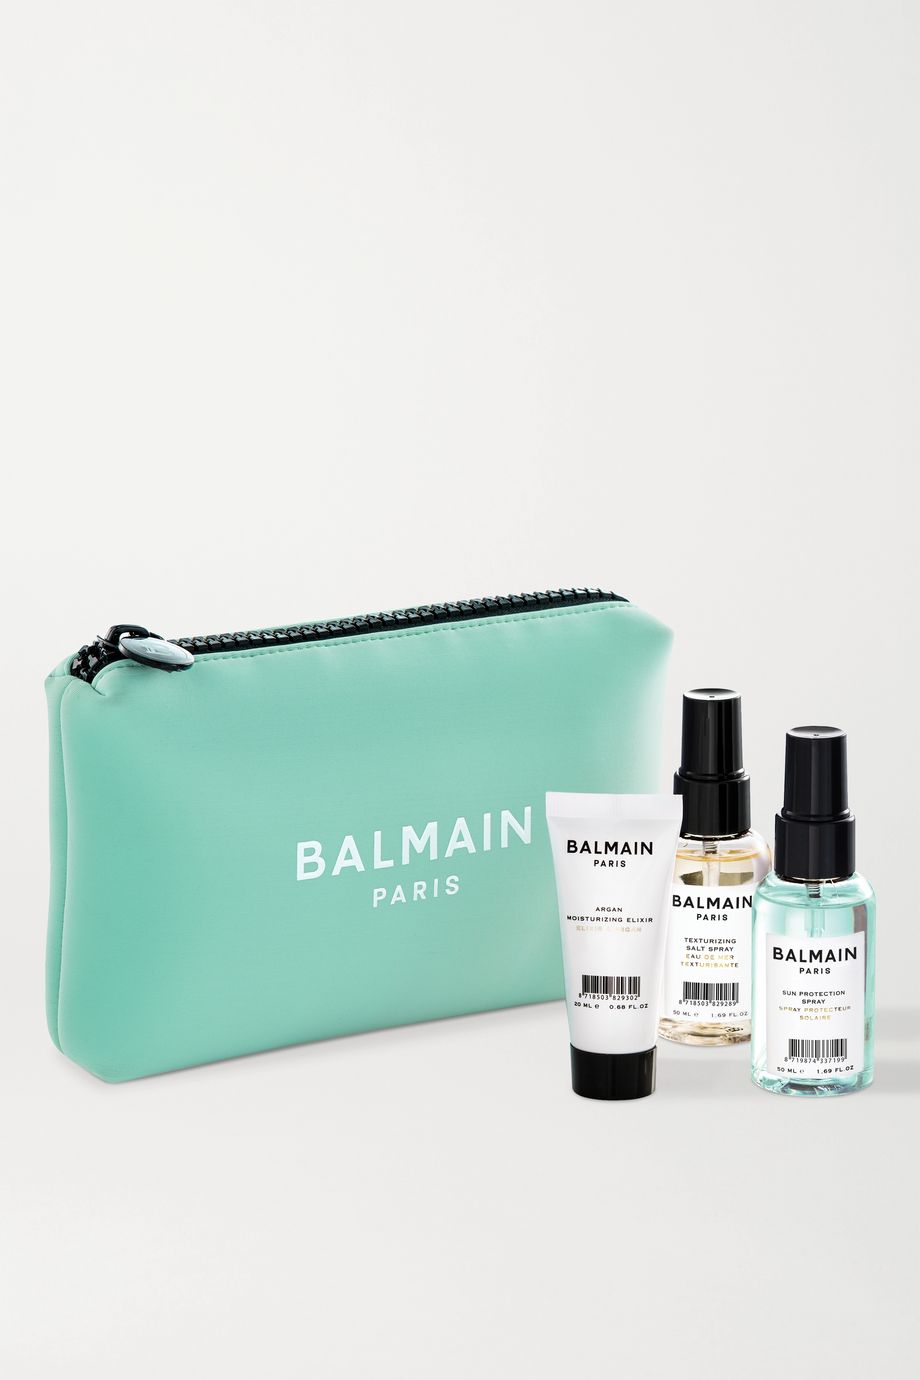 Balmain Paris Hair Couture Spring 2020 Gift Set